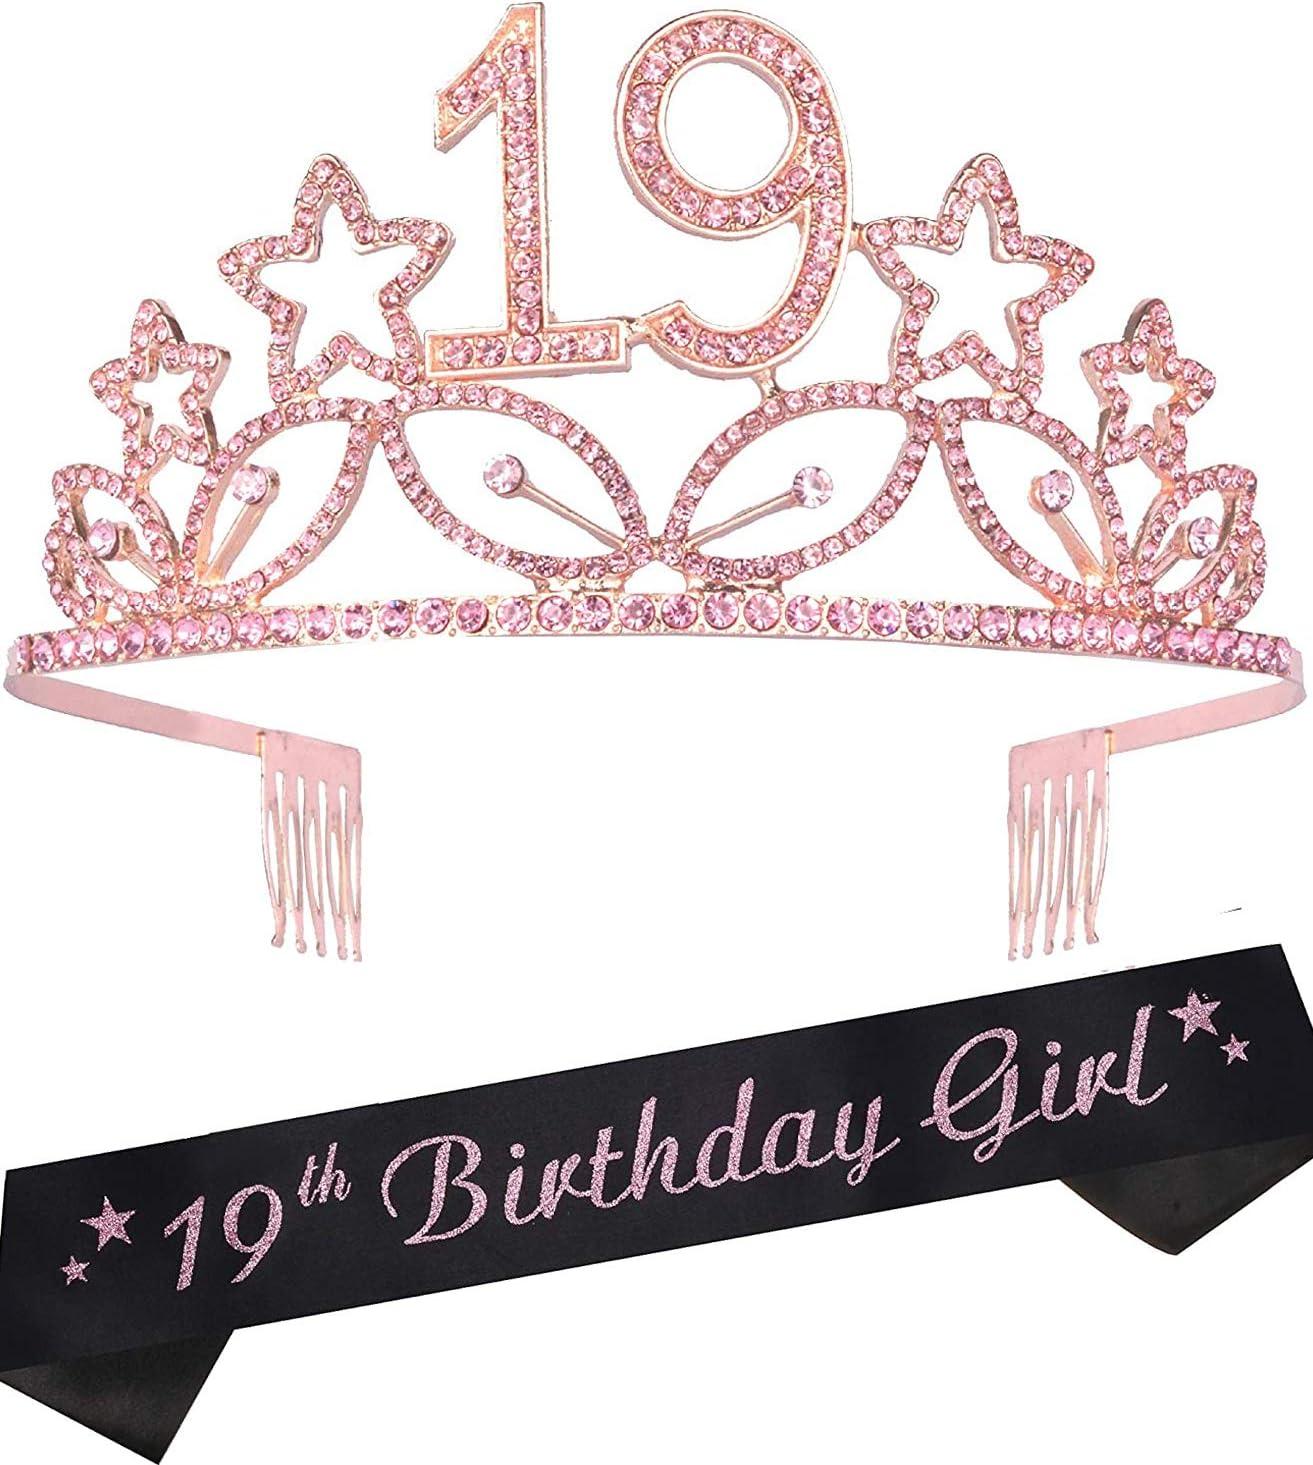 Birthday crown birthday party girls boys baby birth Crown Birthday anniversary